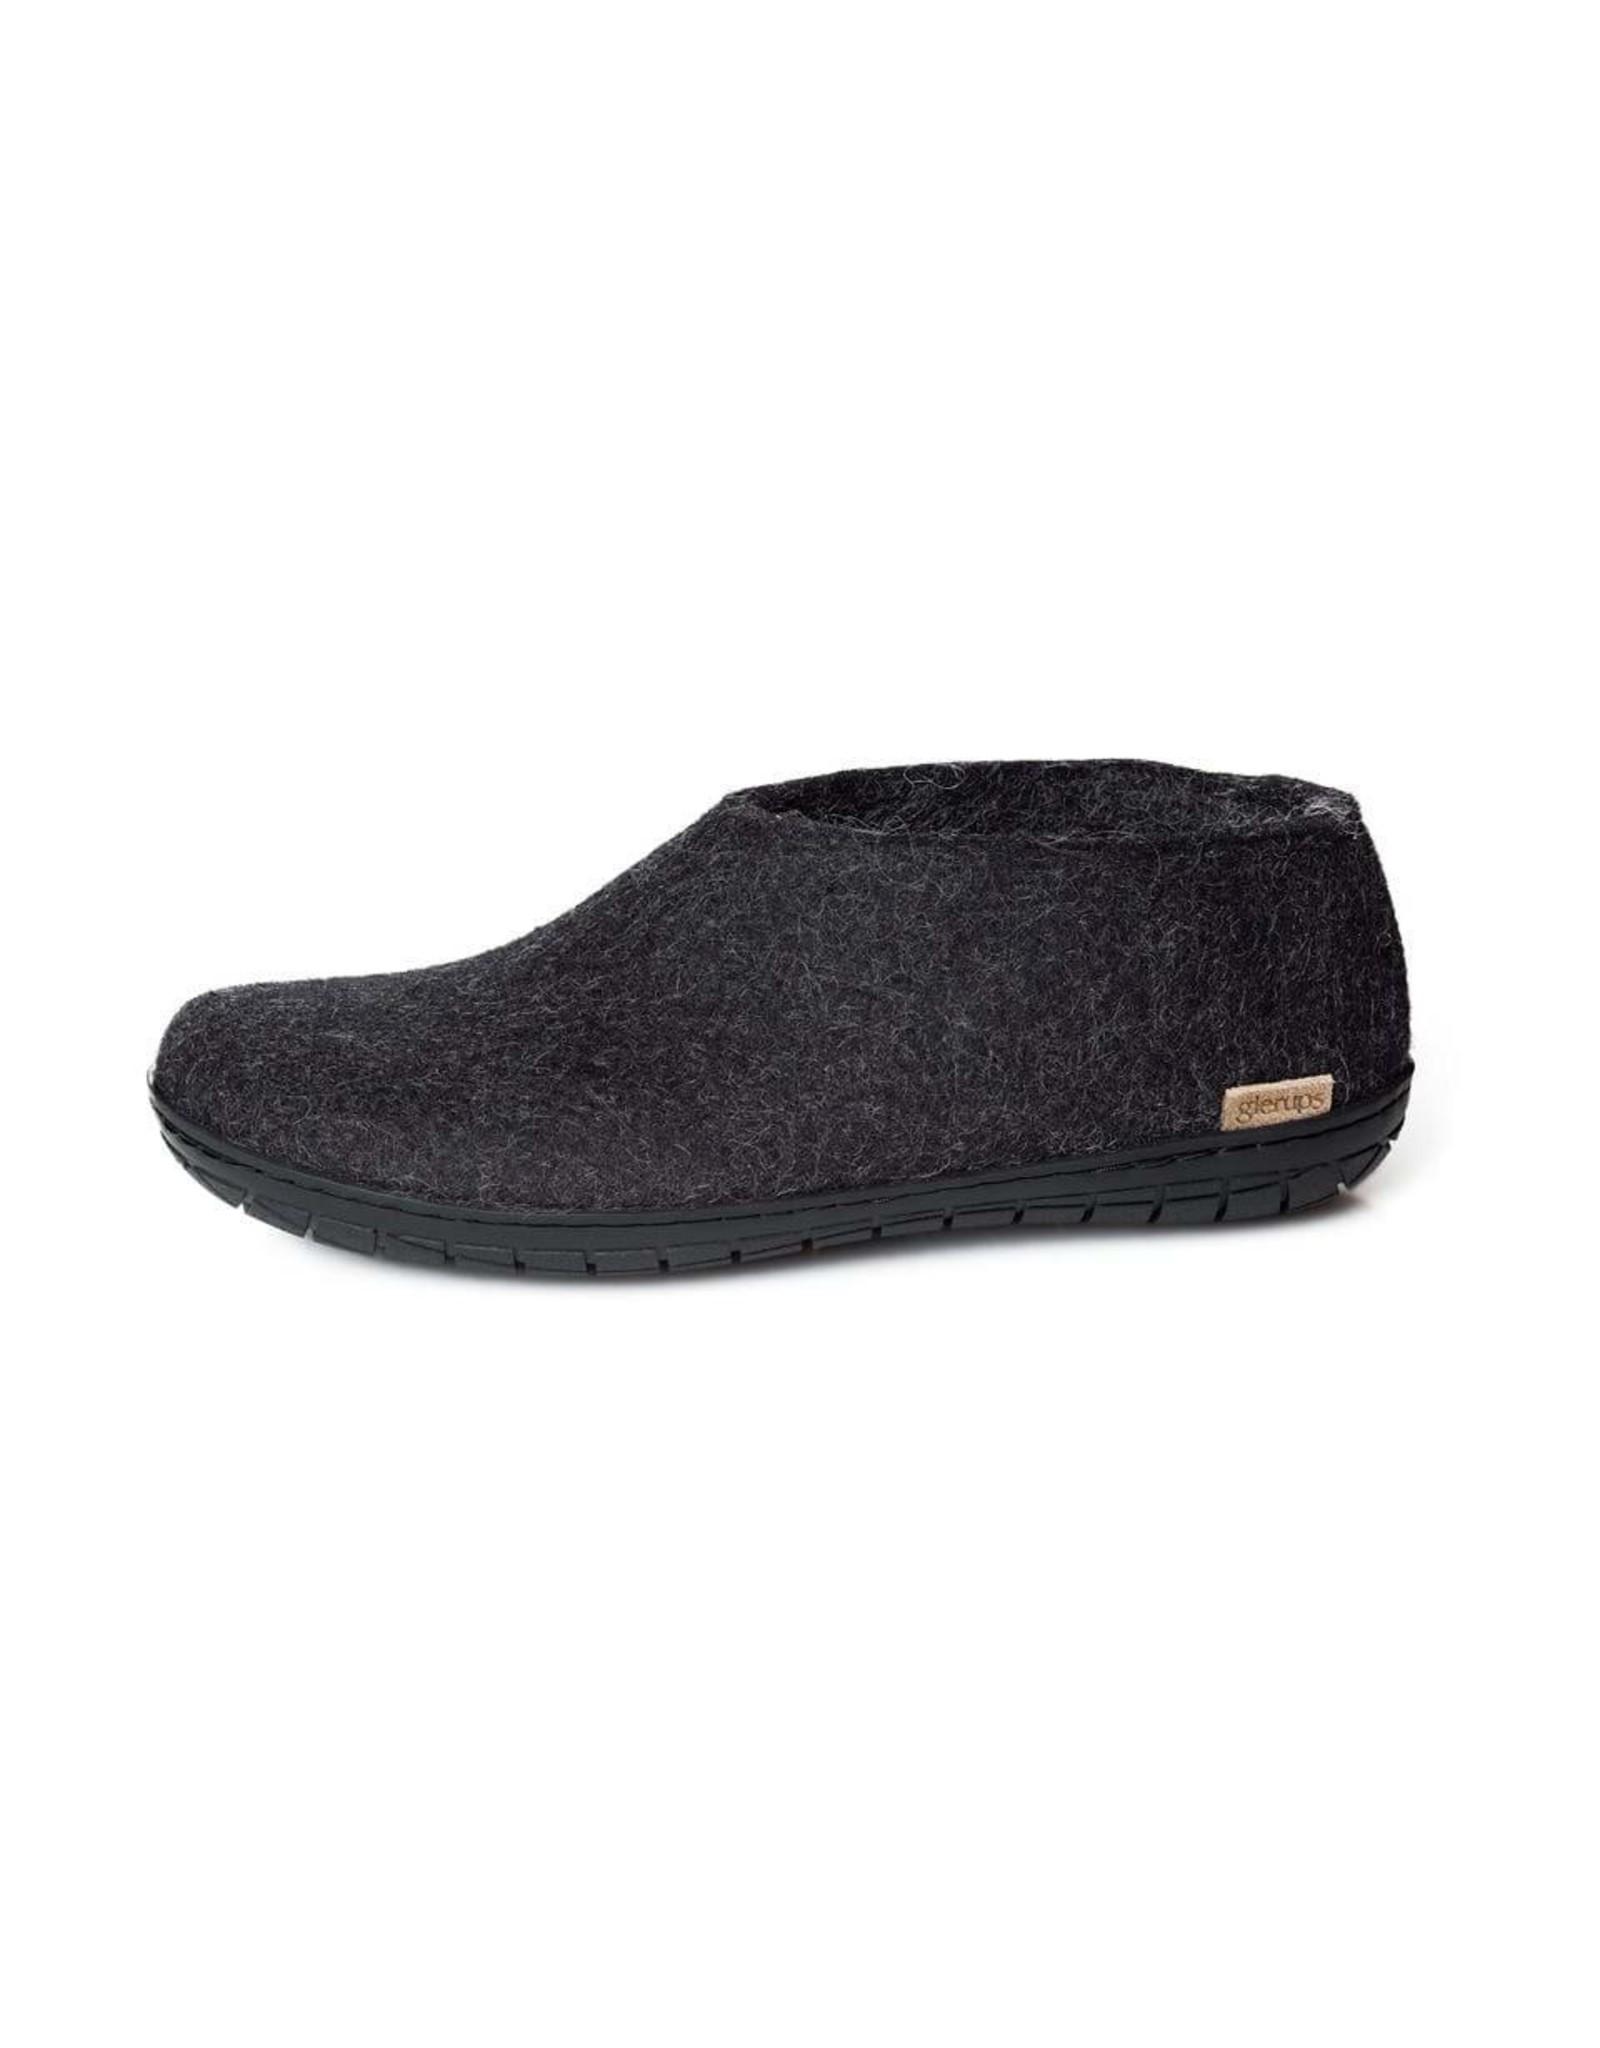 GlerupsUSA Felted Wool Shoe - Outdoor-BLK Sole